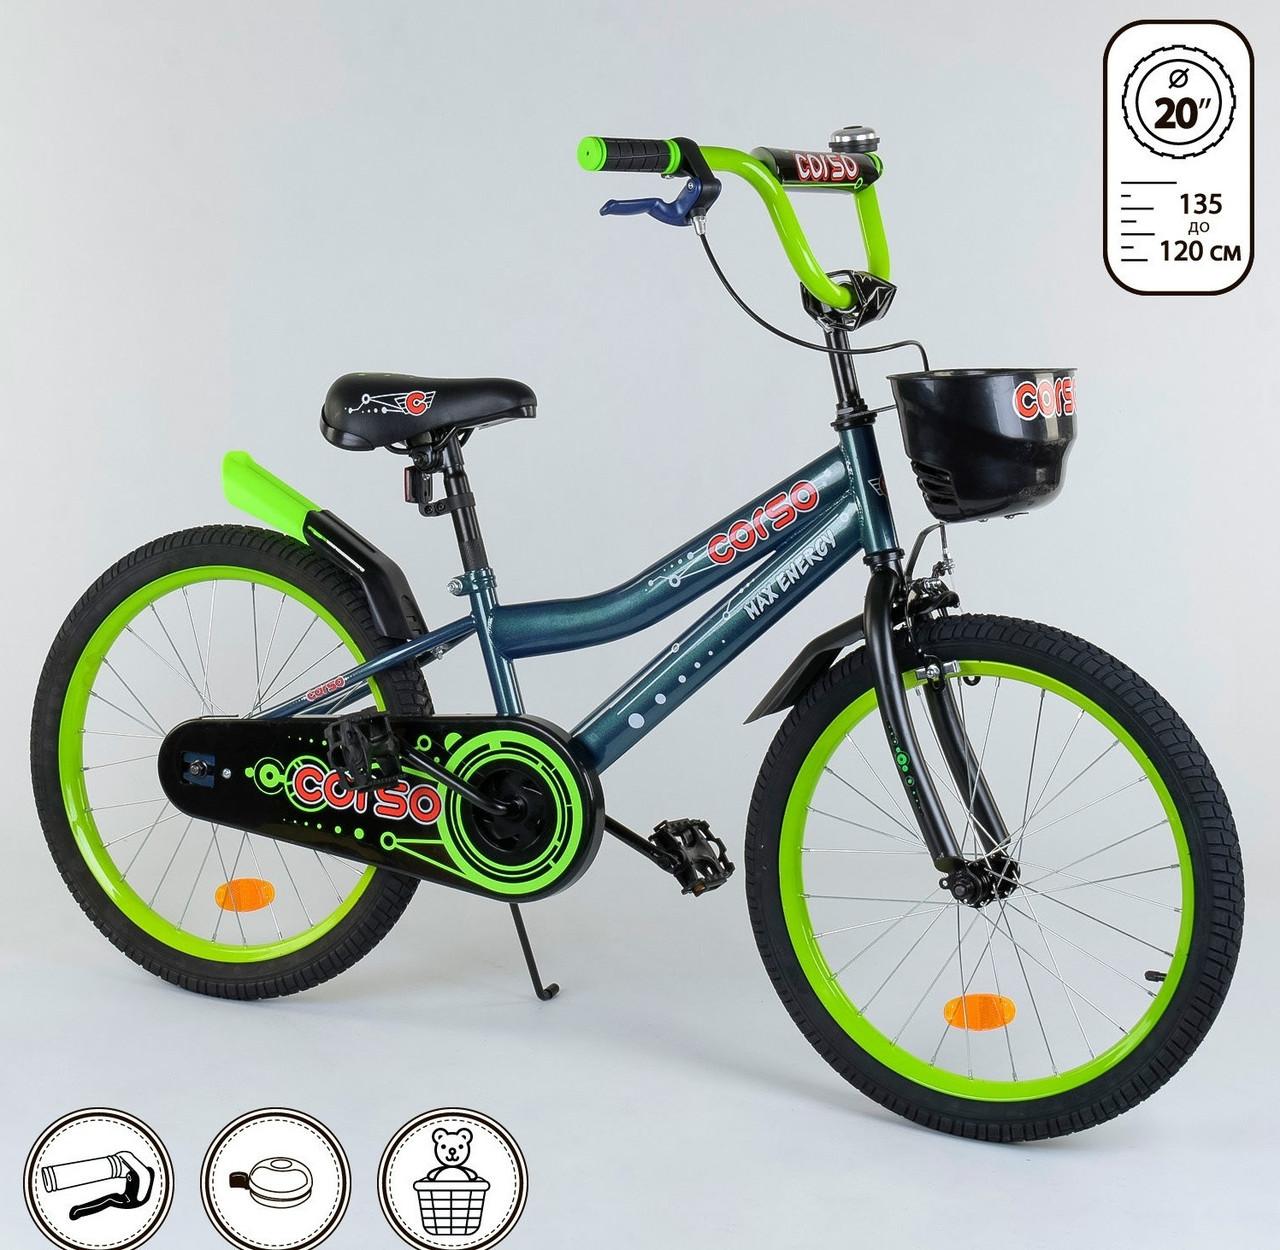 "Corso Велосипед Corso 20"" Max Energy R - 20975 Grey / Lime (R - 20975)"